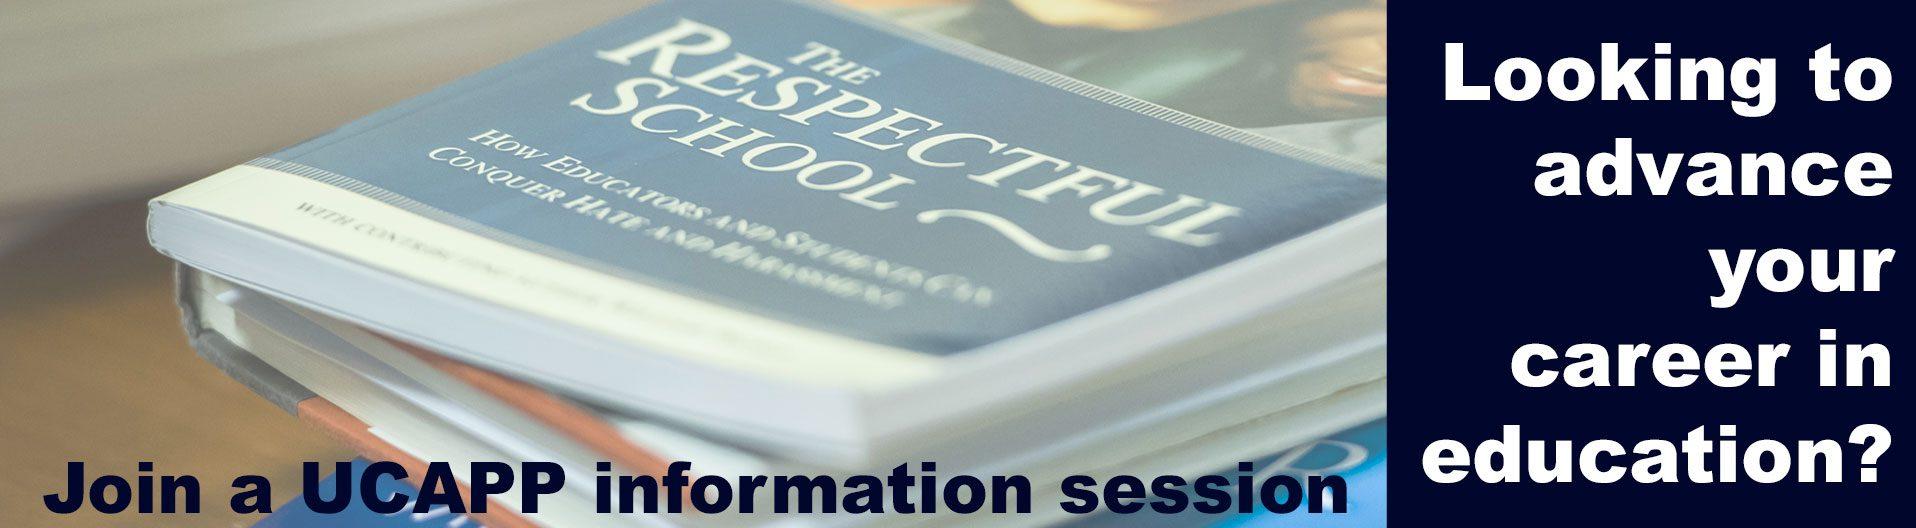 UCAPP Information sessions, book on respectful schools